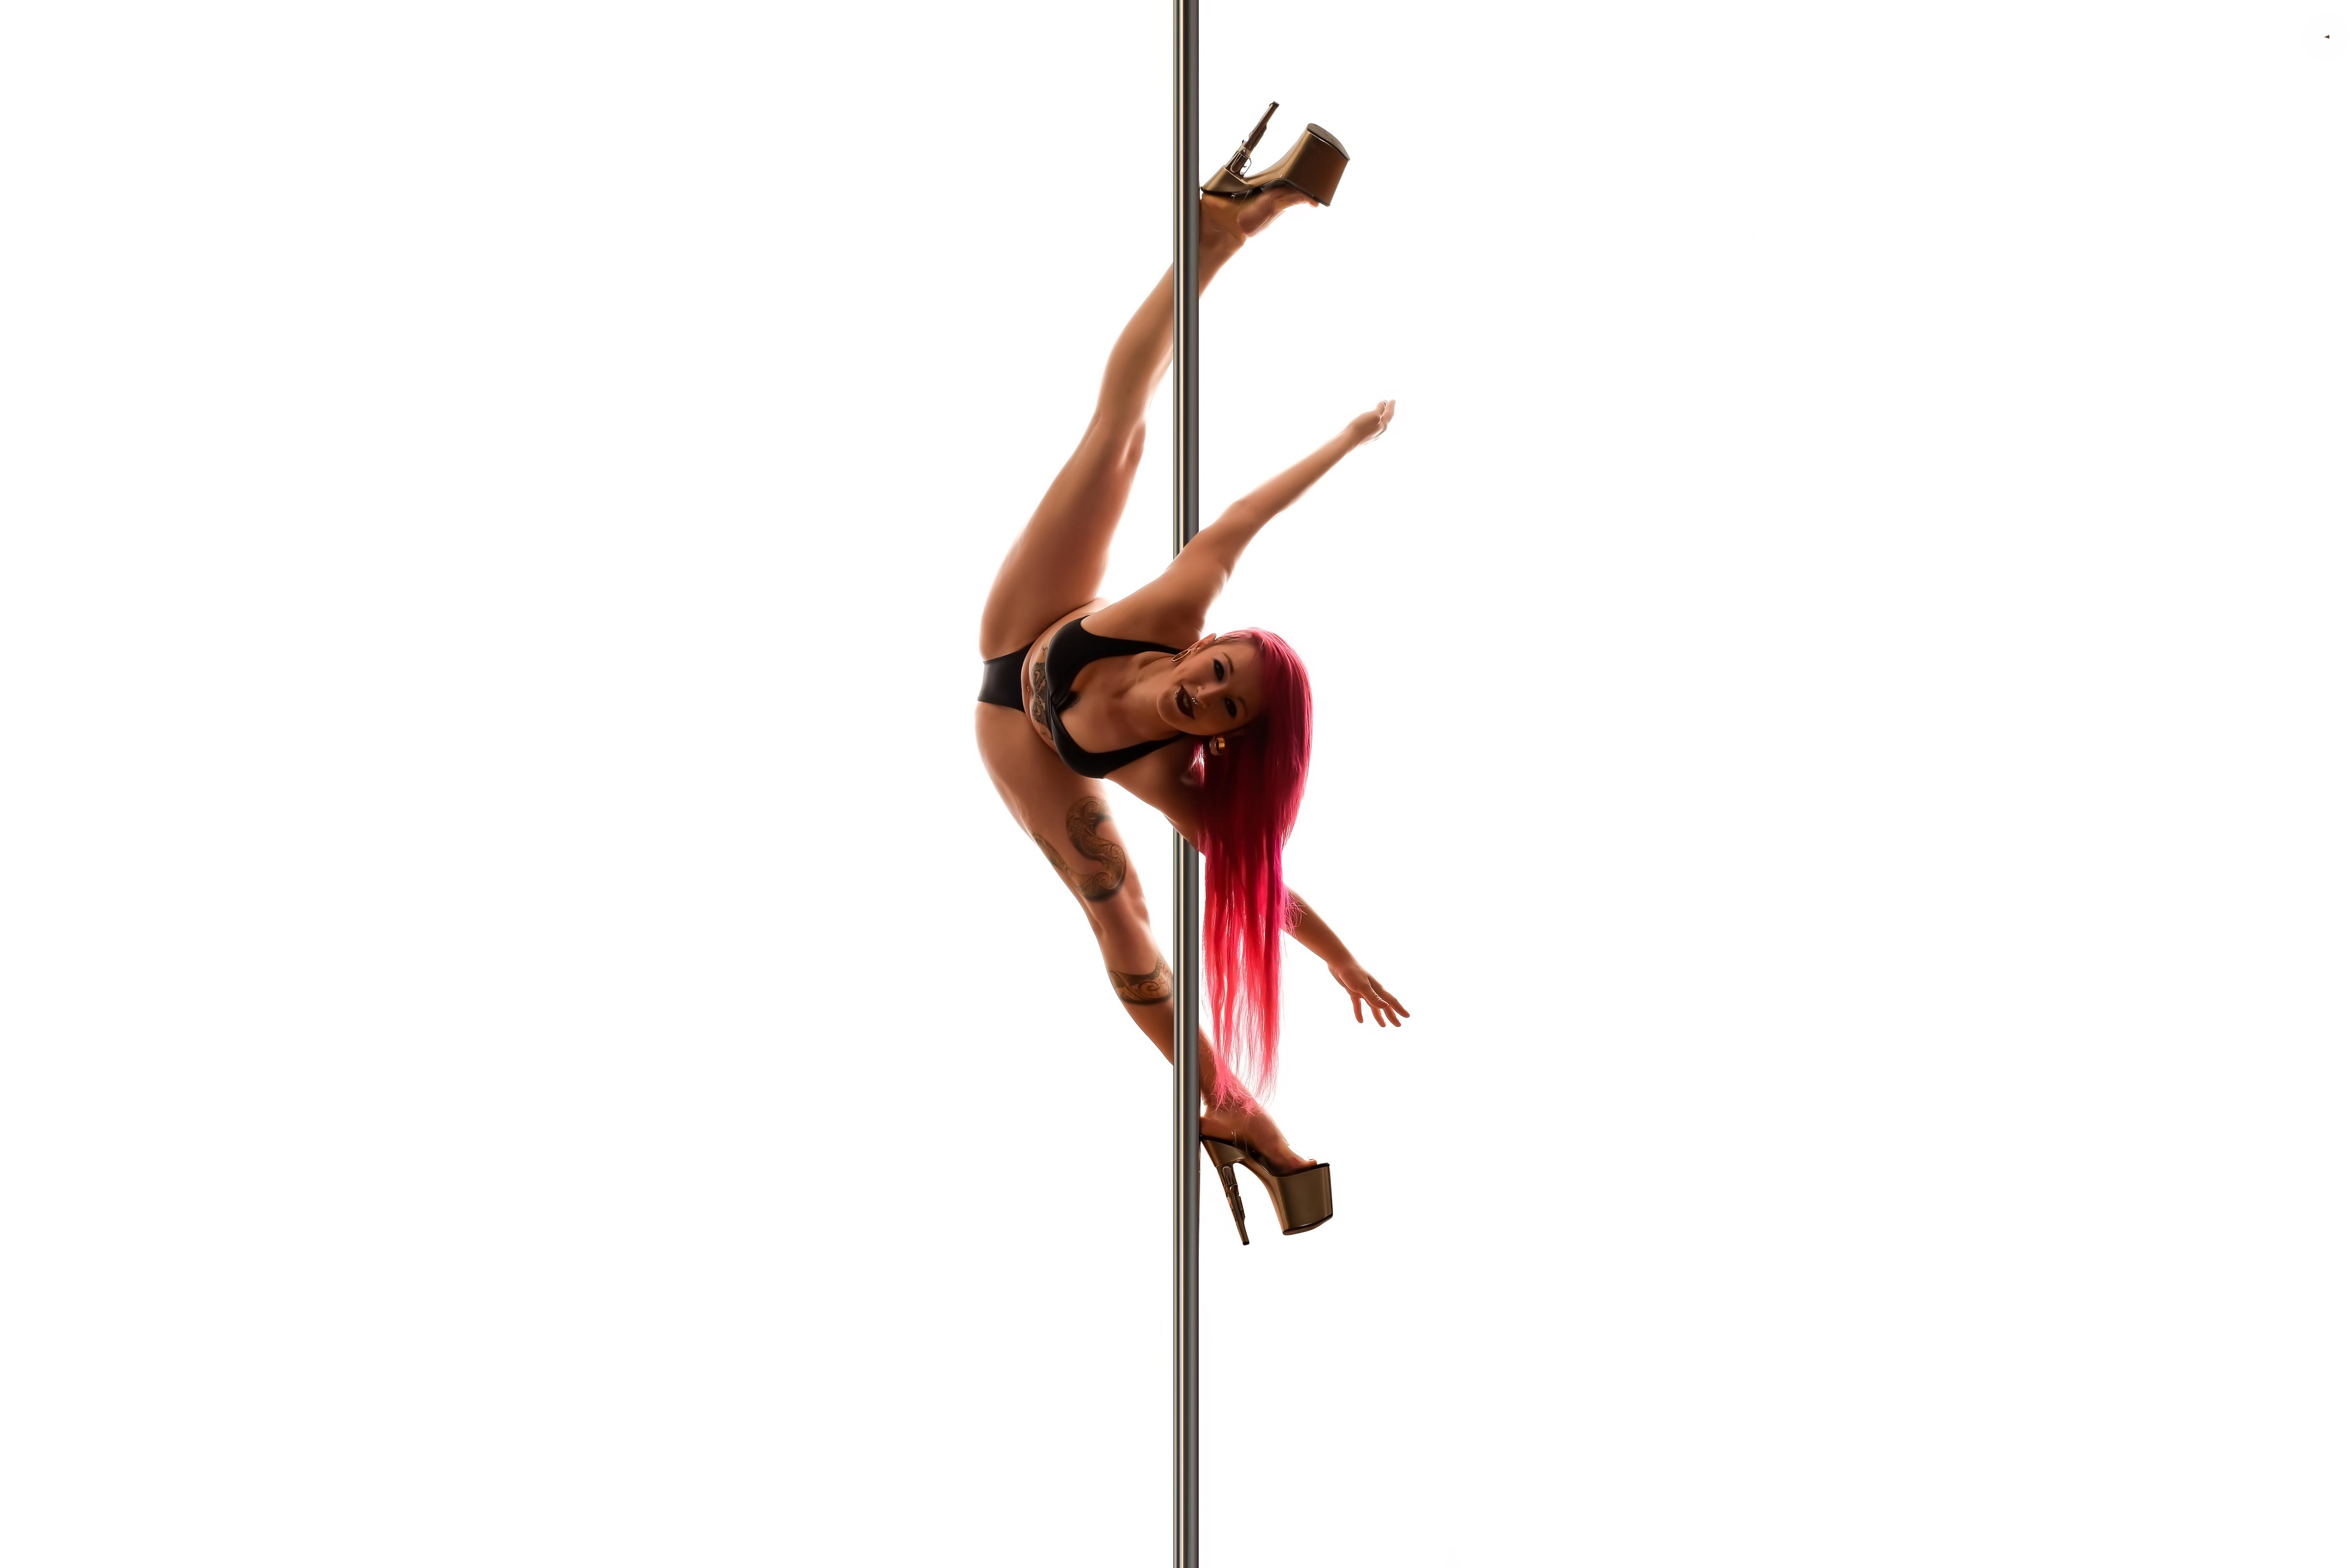 Advanced Pole Pole Dance Kurse für Fortgeschrittene Mandy Candy's Pole Dance Studio